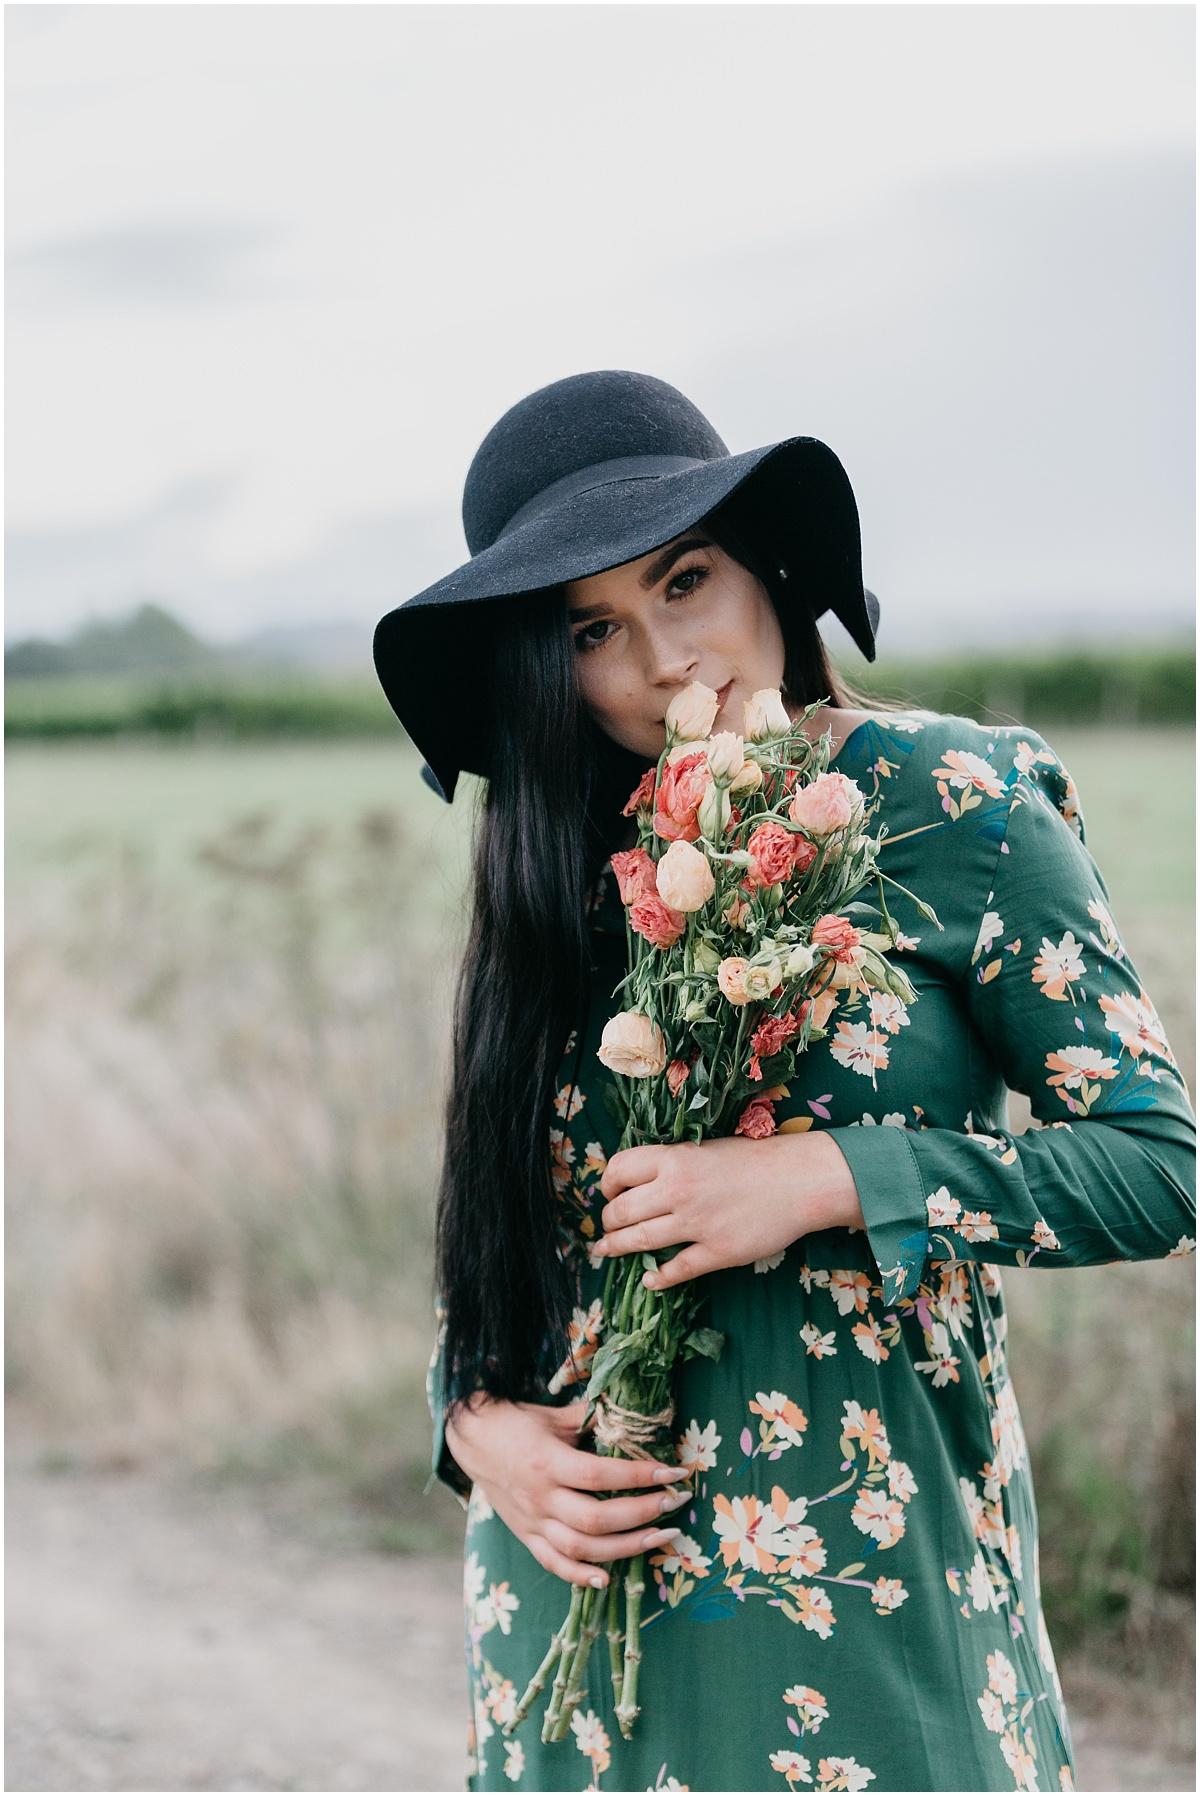 Woman in green dress smelling bouquet of flowers